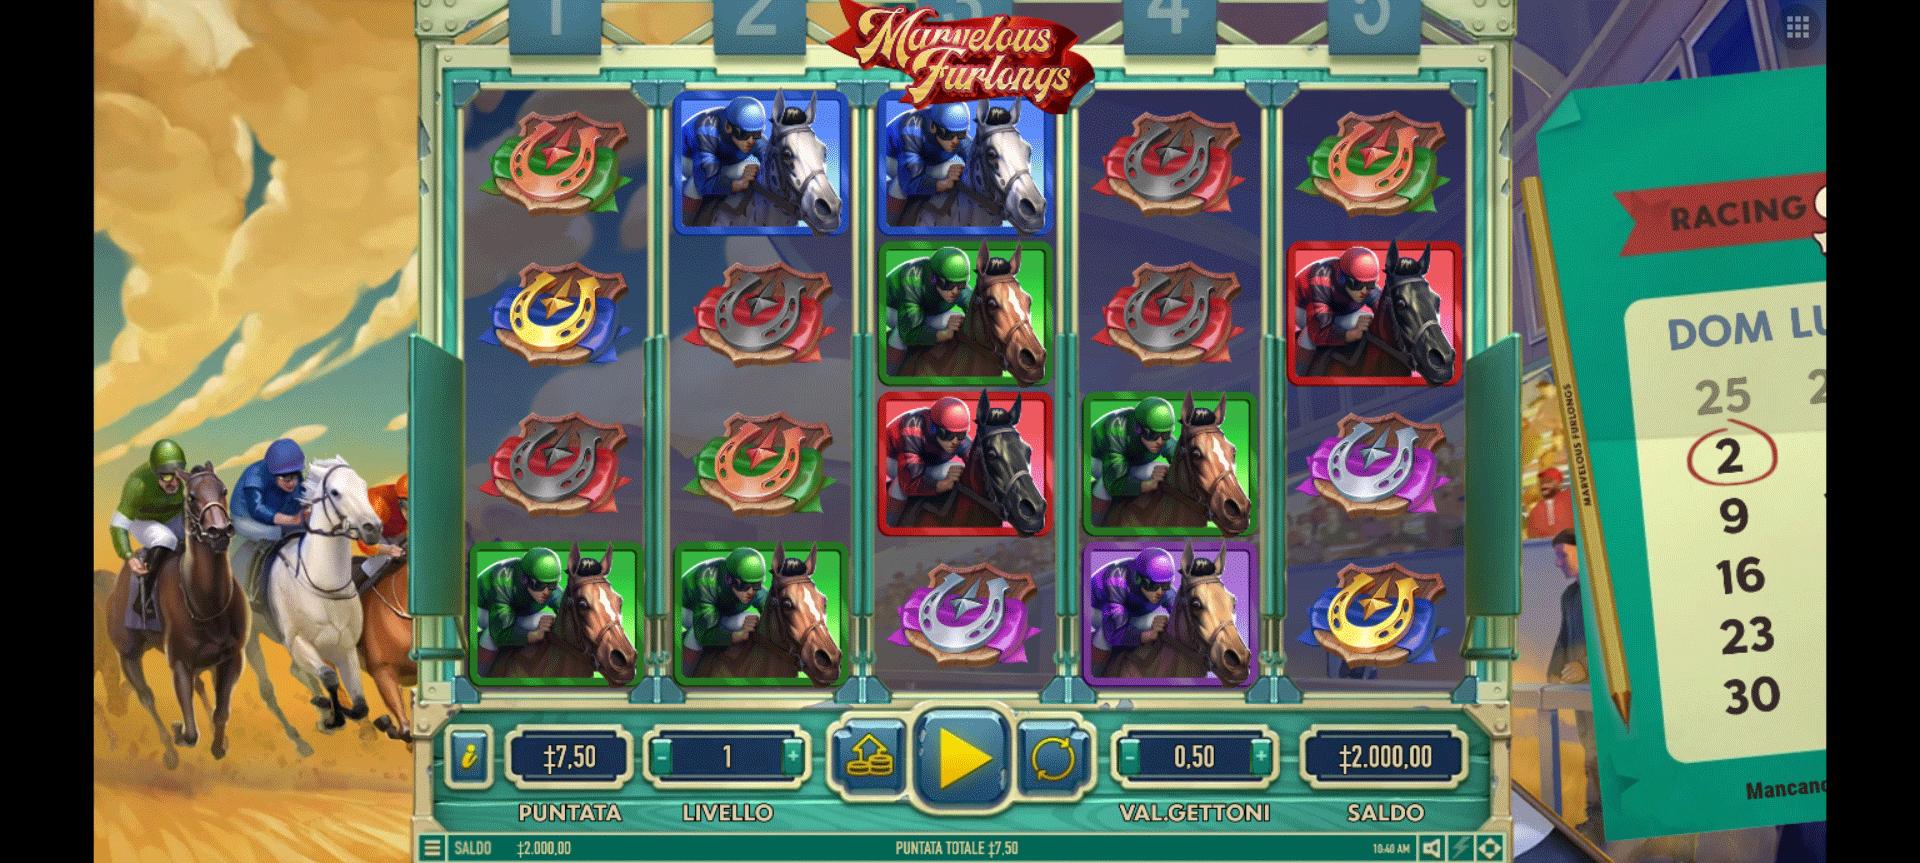 Slot Marvelous Furlongs